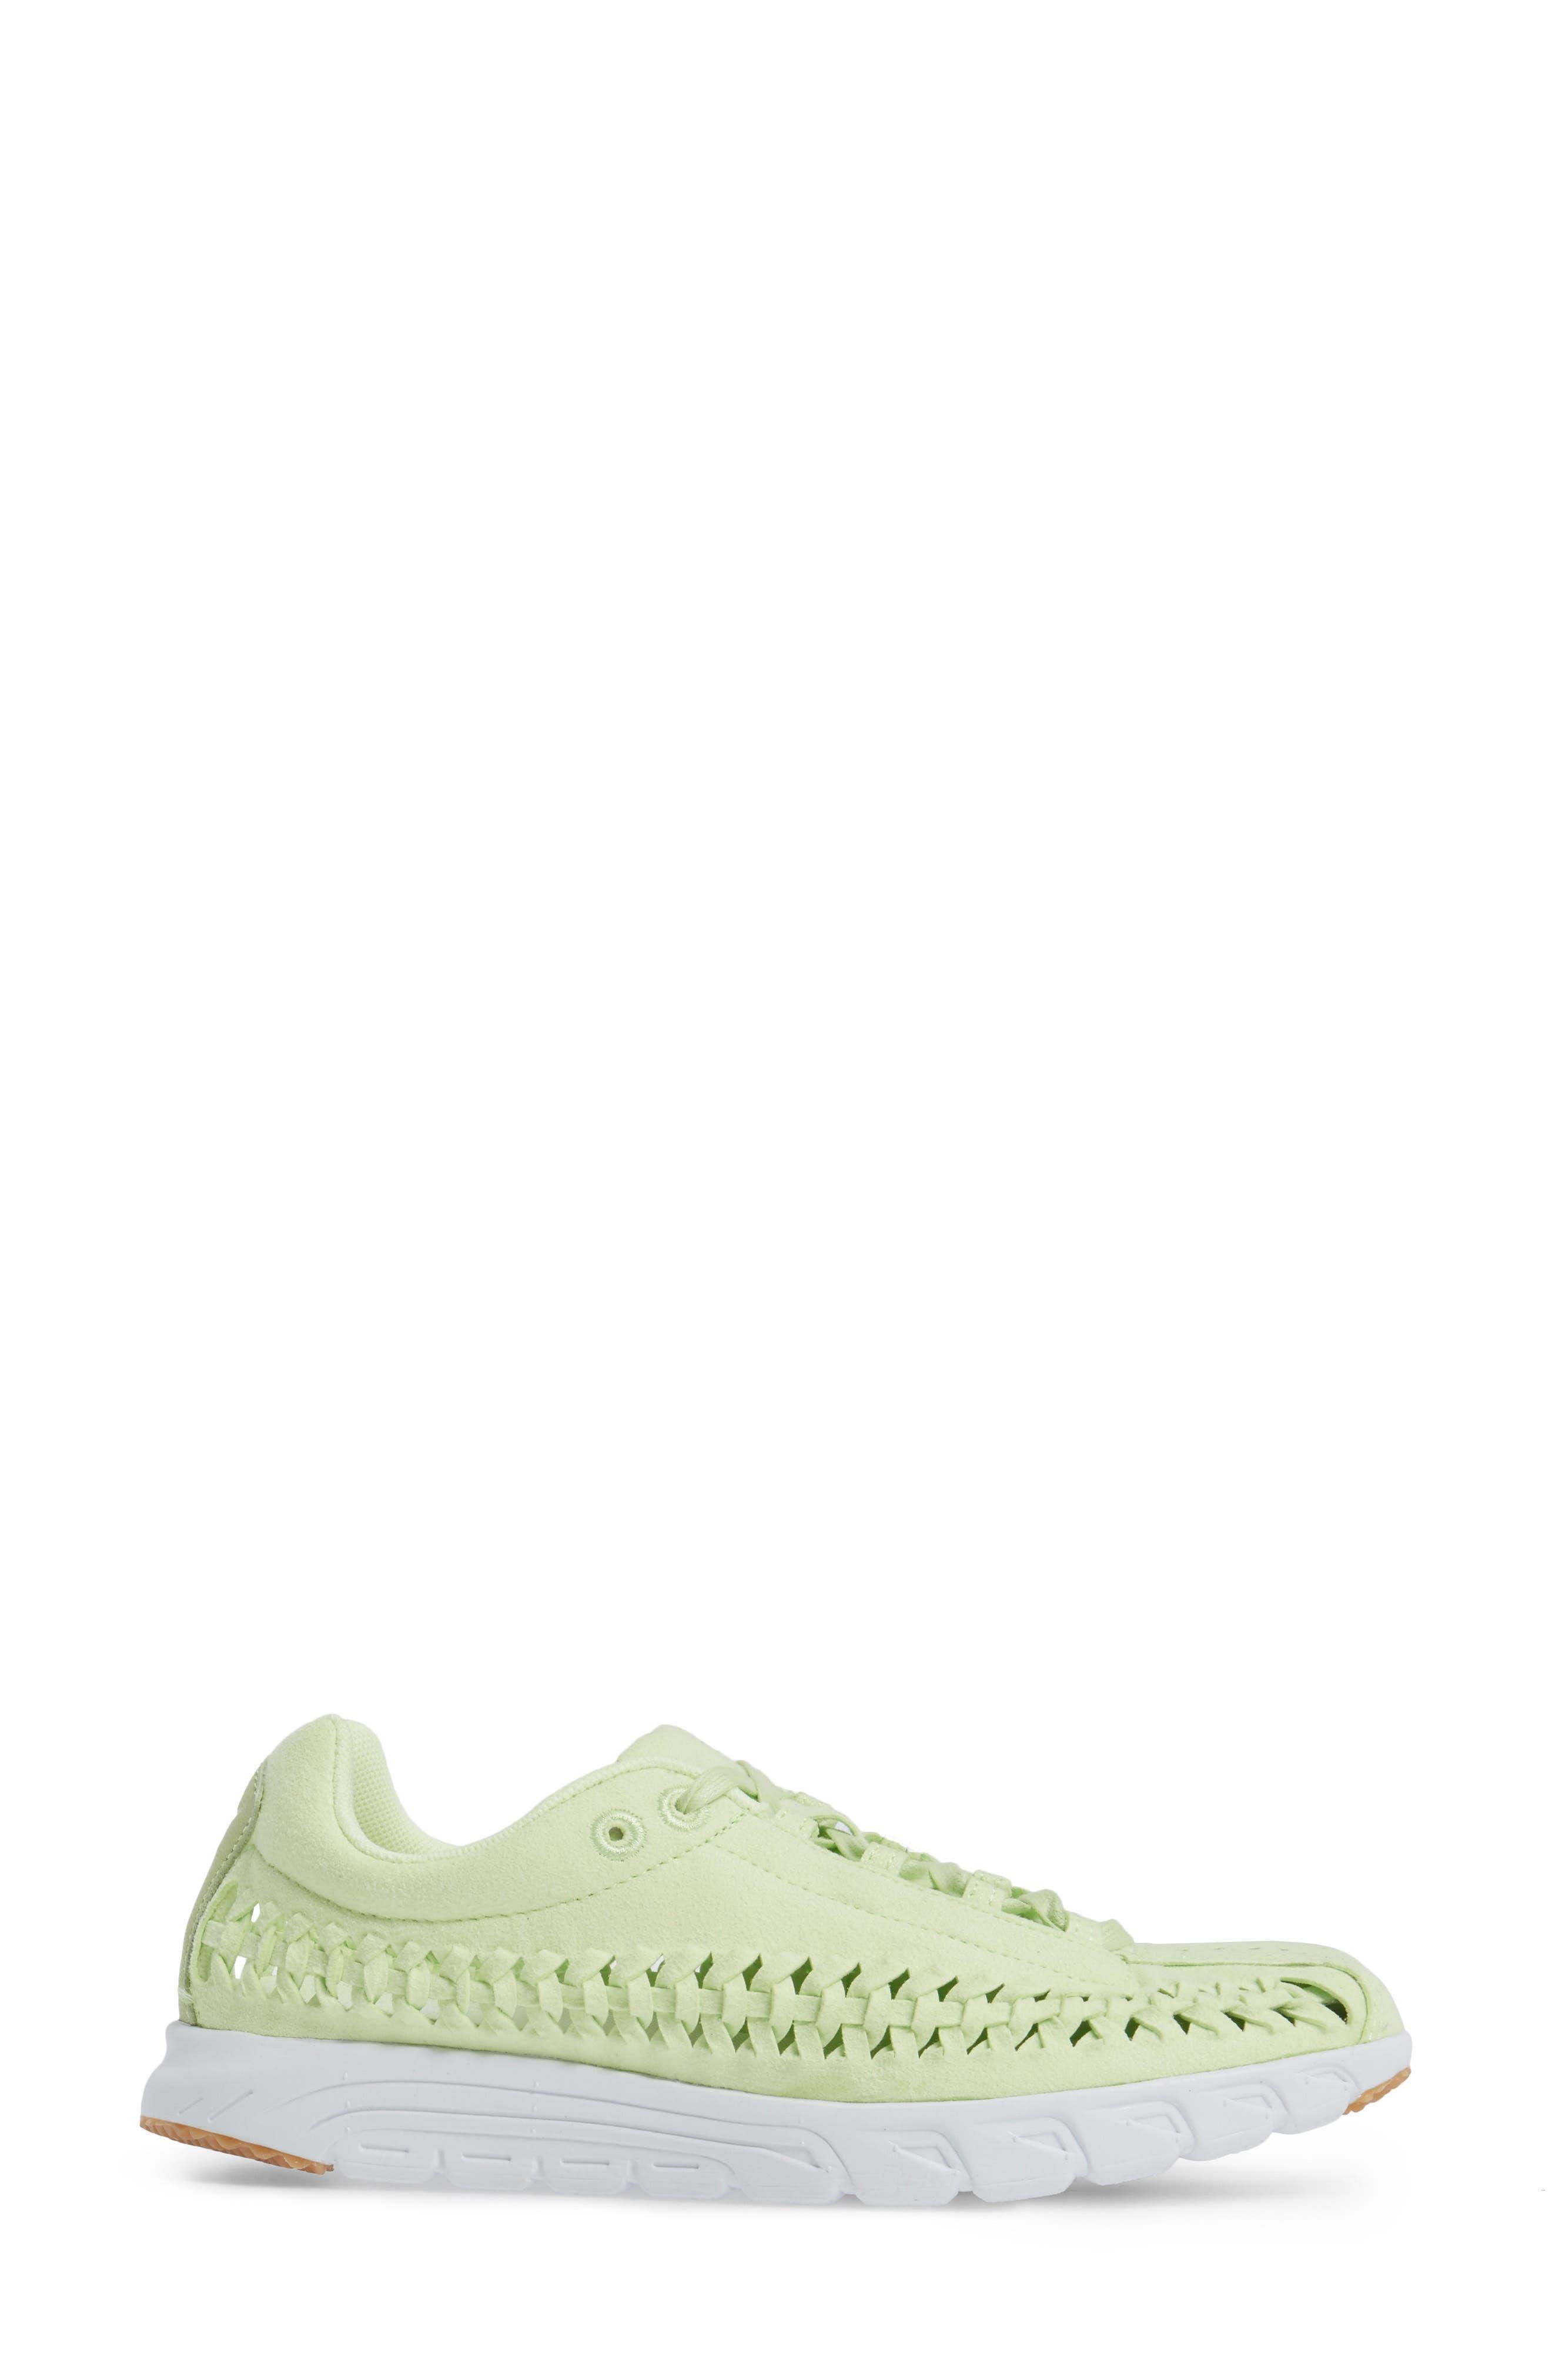 Mayfly Woven QS Sneaker,                             Alternate thumbnail 3, color,                             301